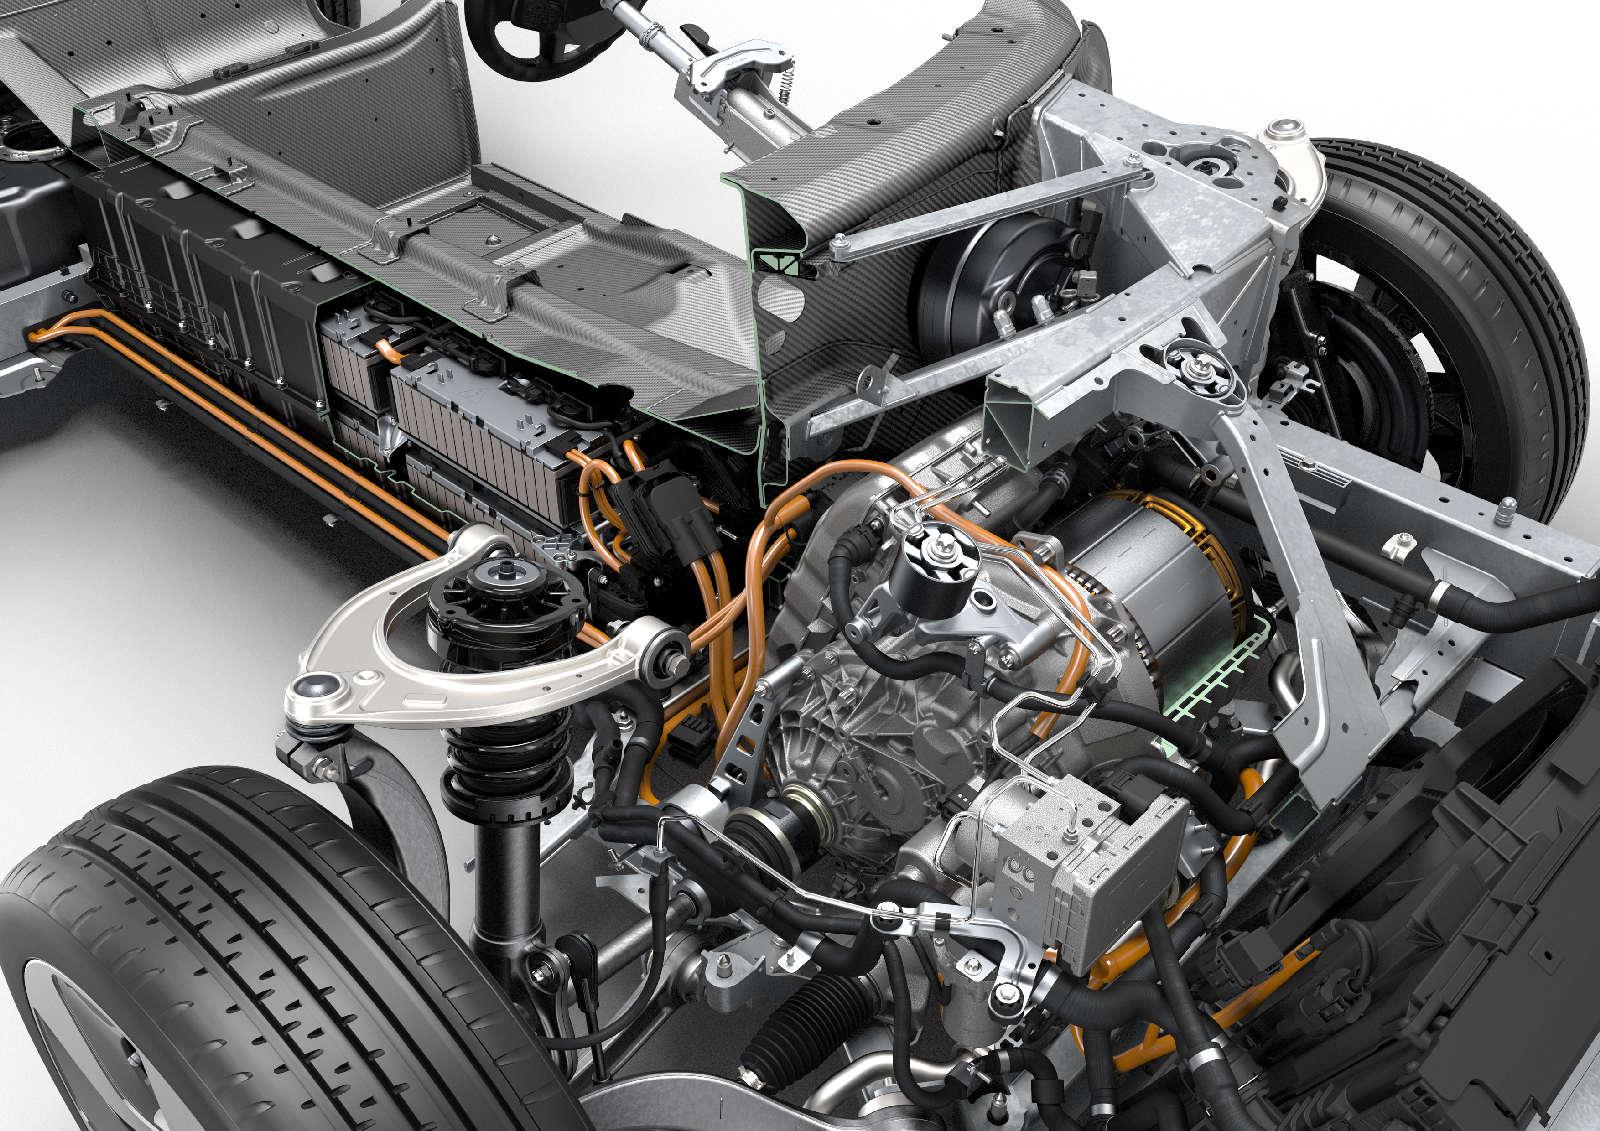 Fotos Audi e-tron quattro concept: SUV, deportivo y eléctrico bwin world cup of darts - australië klopt de russen - prodarts